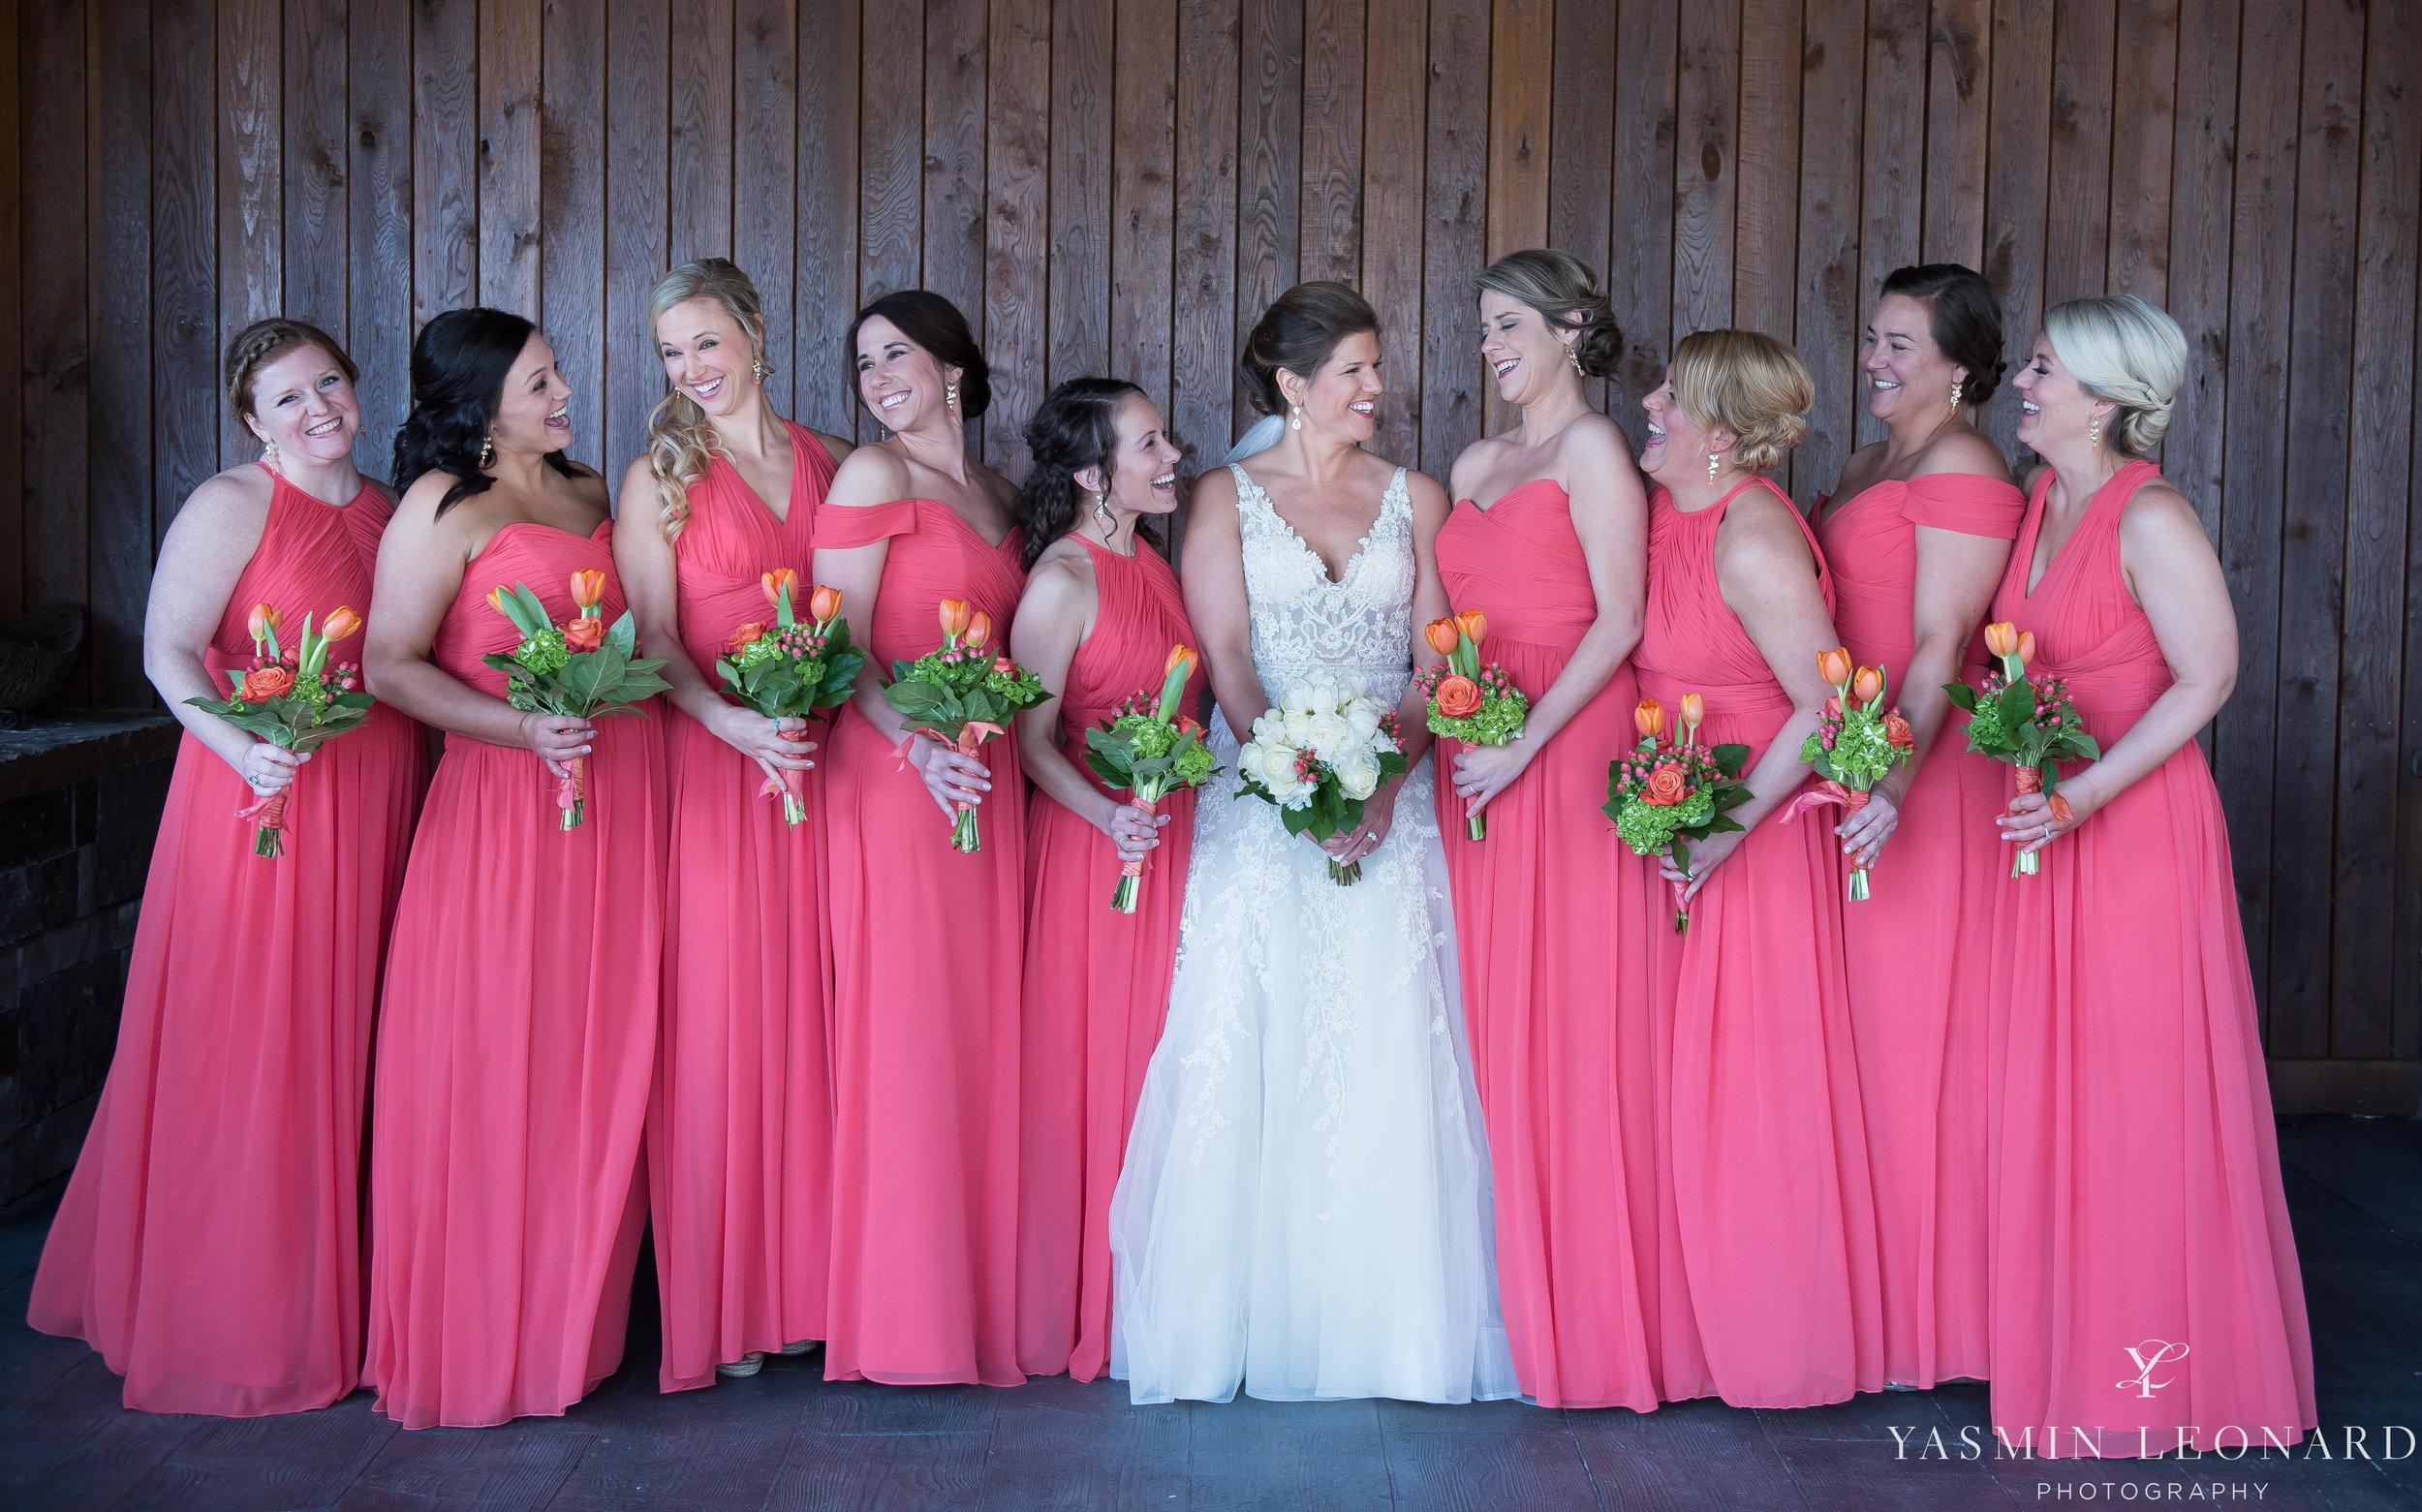 Adaumont Farm - Adaumont Farm Weddings - Trinity Weddings - NC Weddings - Yasmin Leonard Photography-13.jpg